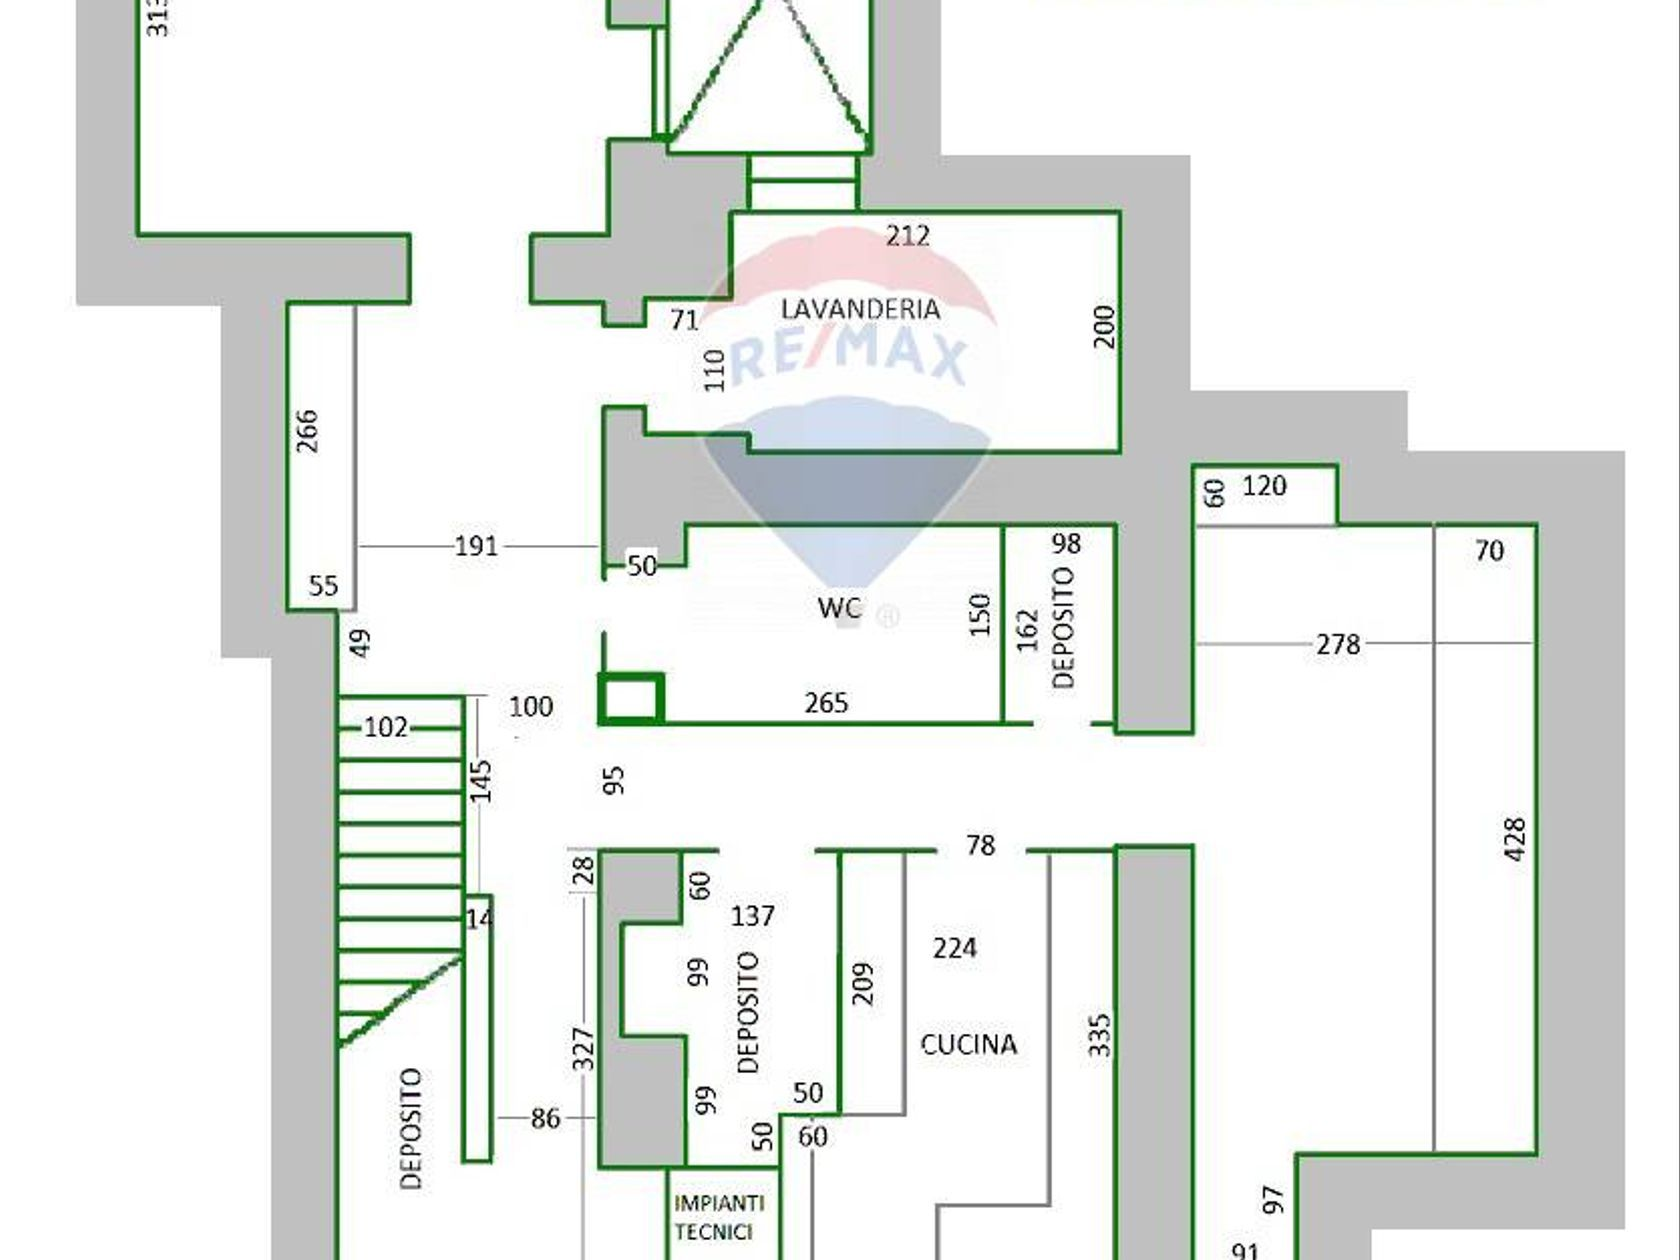 Villa singola Aventino, Roma, RM Vendita - Planimetria 2